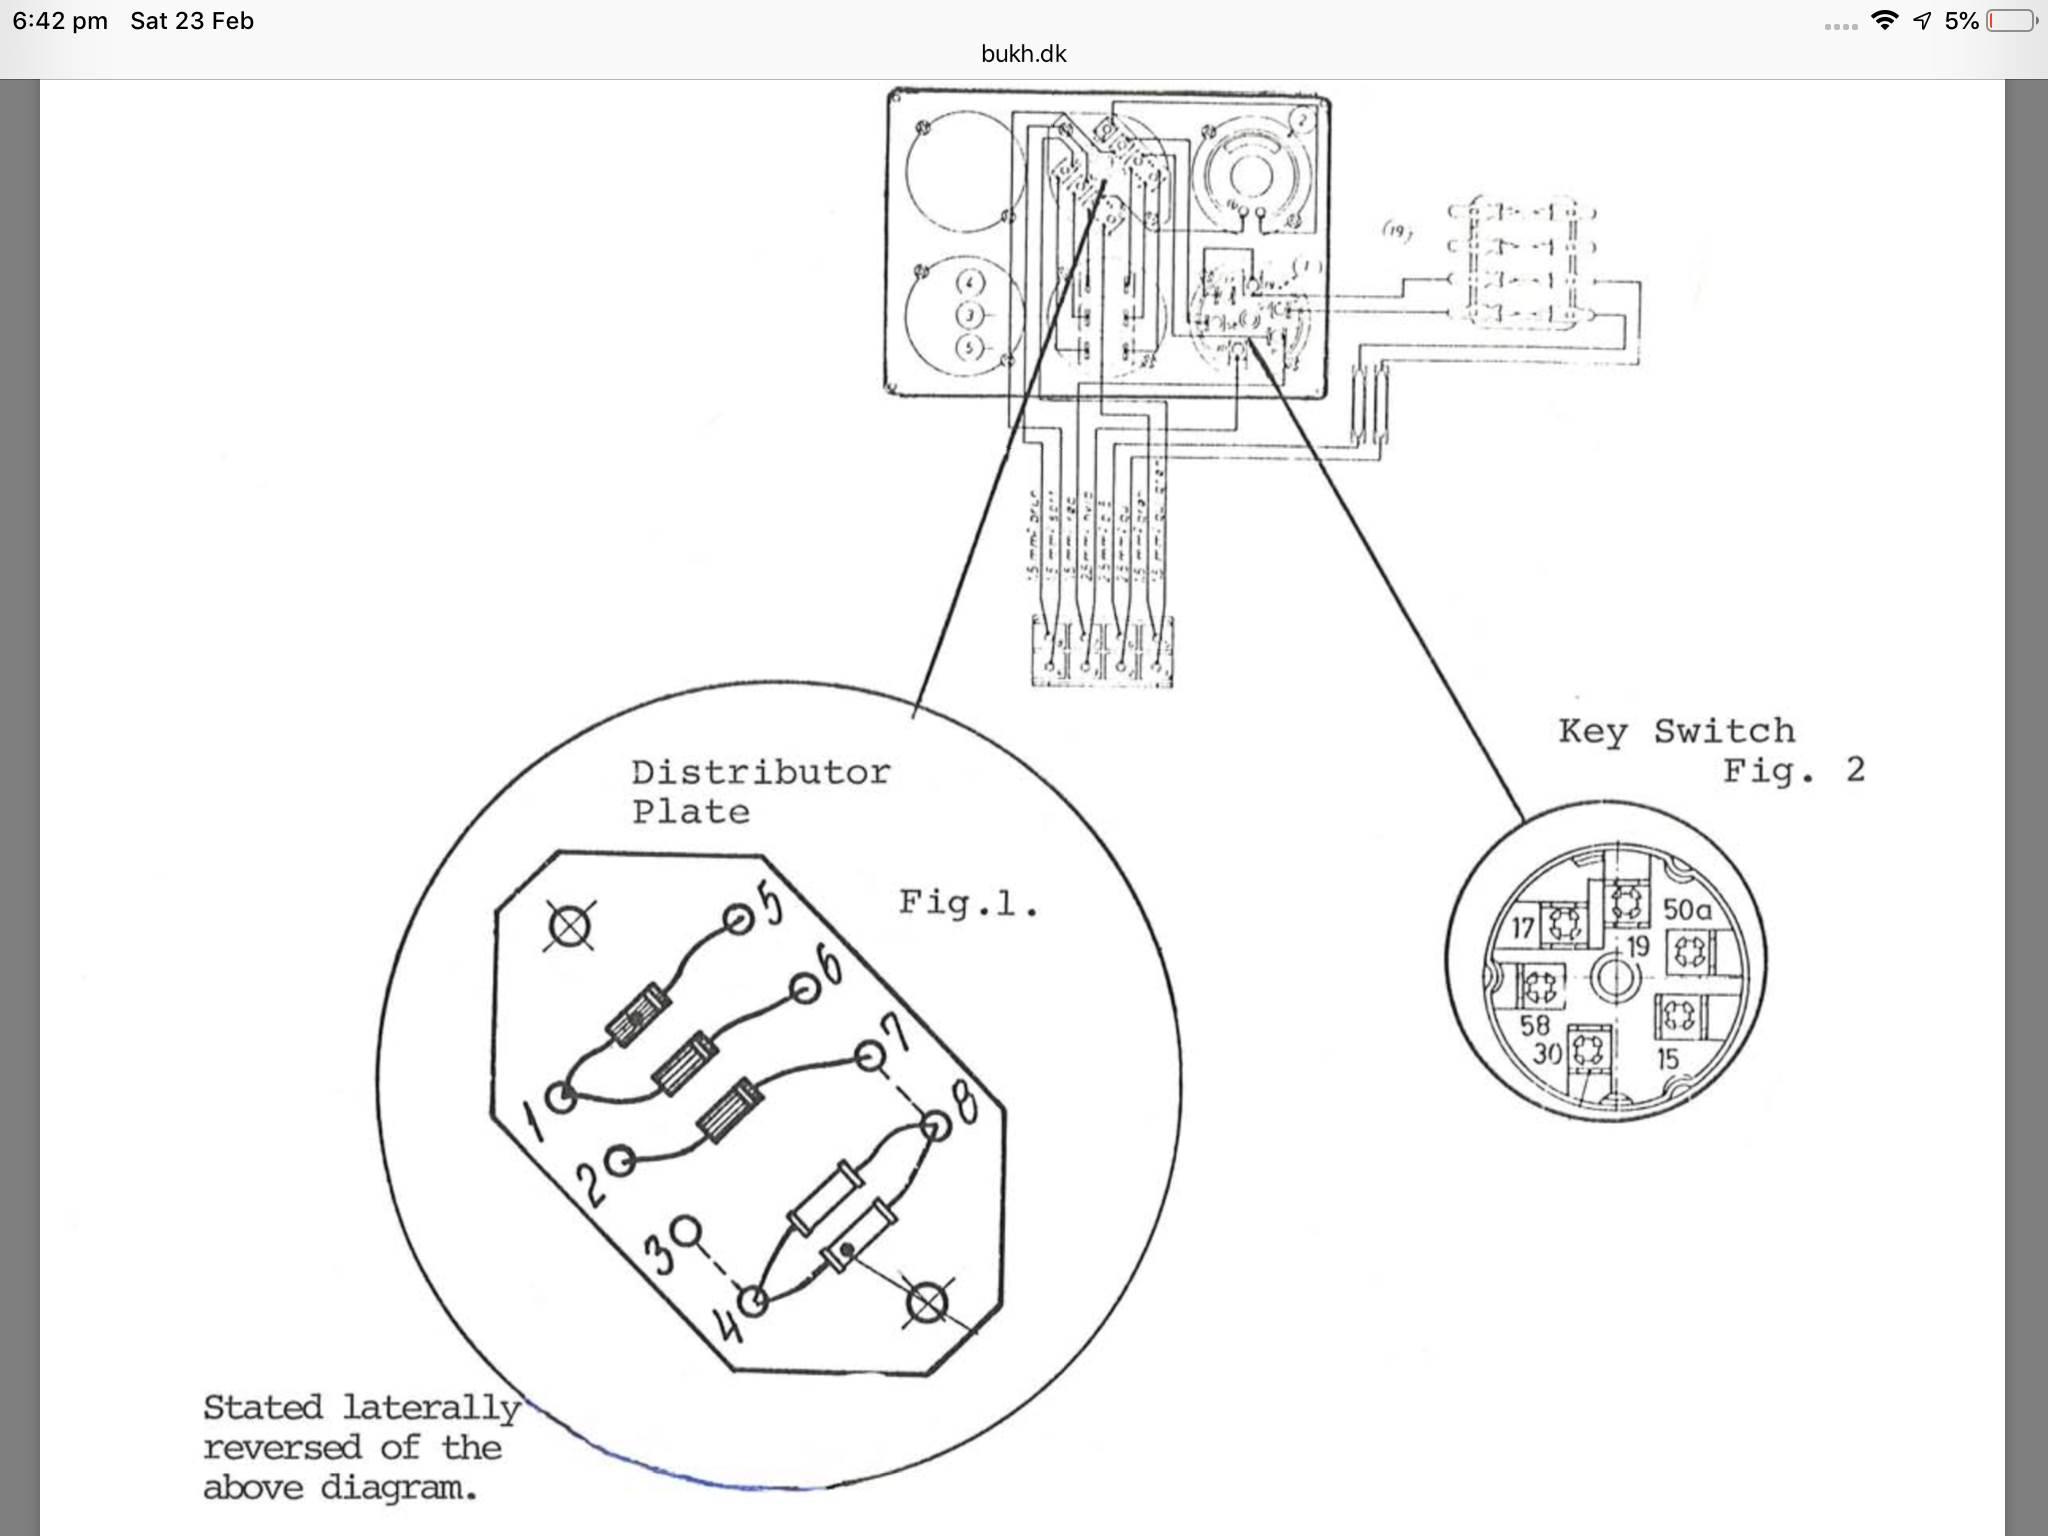 Wiring Diagram Besides Tachometer Wiring Diagram As Well Tach Wiring